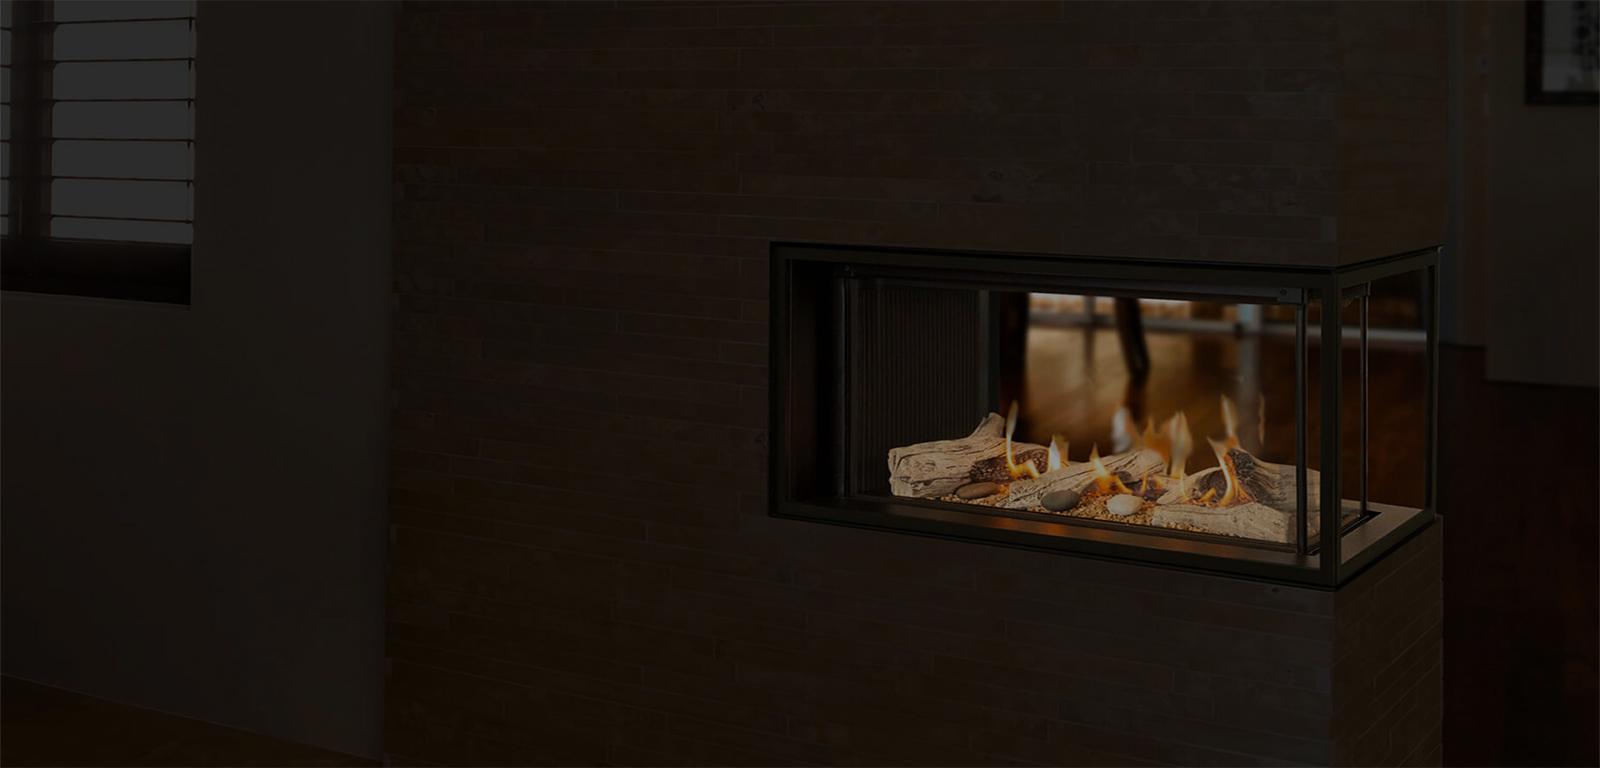 Help — My Gas Fireplace Won't Turn On!